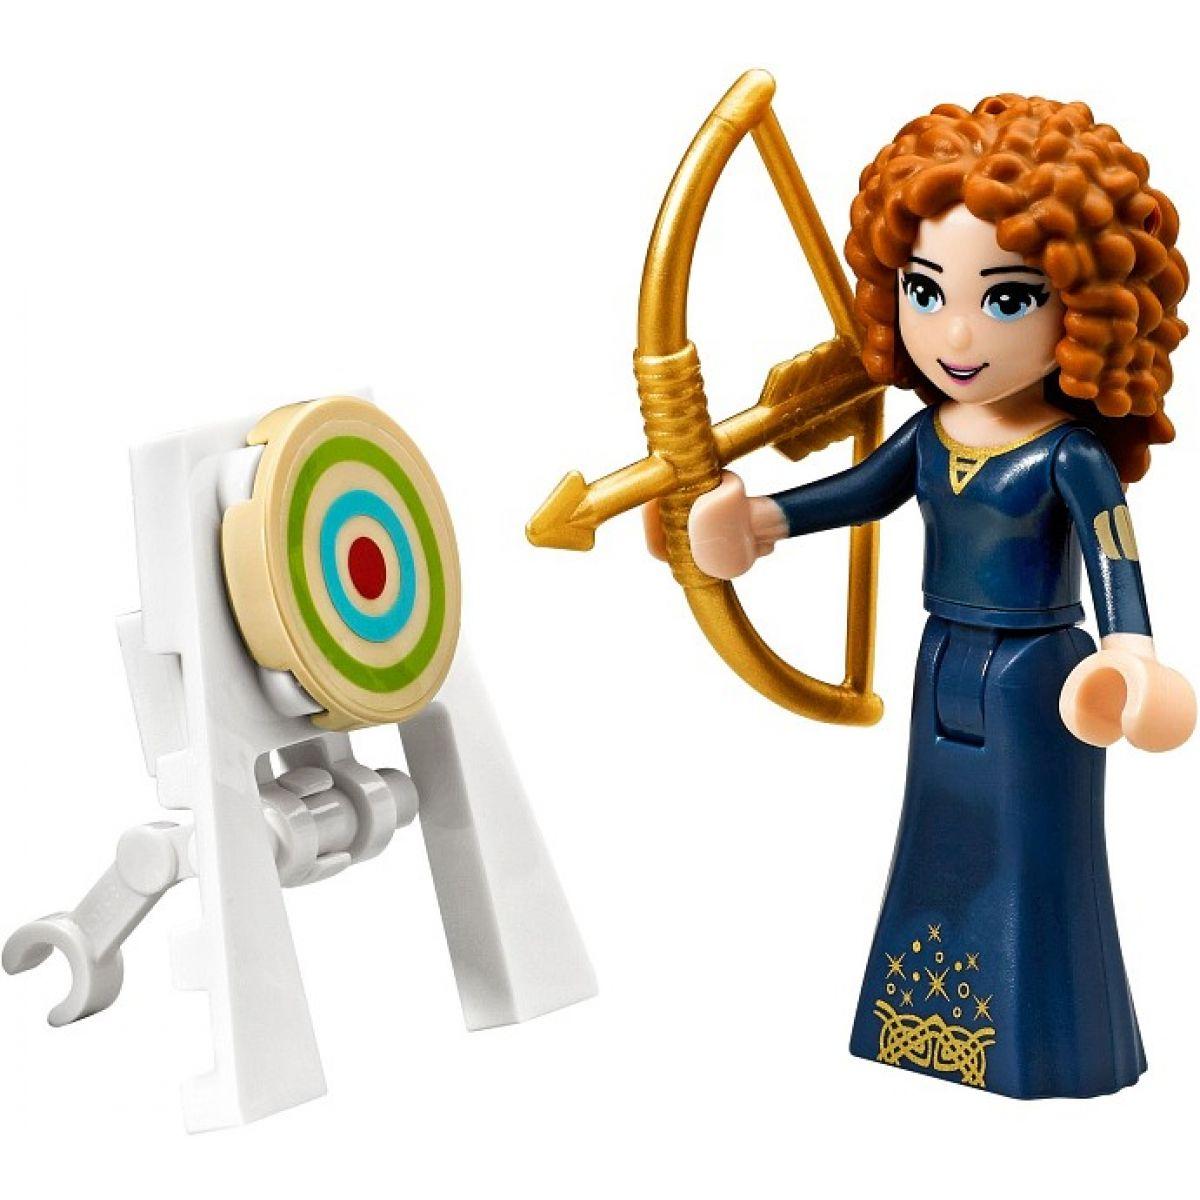 LEGO Disney Princess 41051 Hry princezny Meridy #5